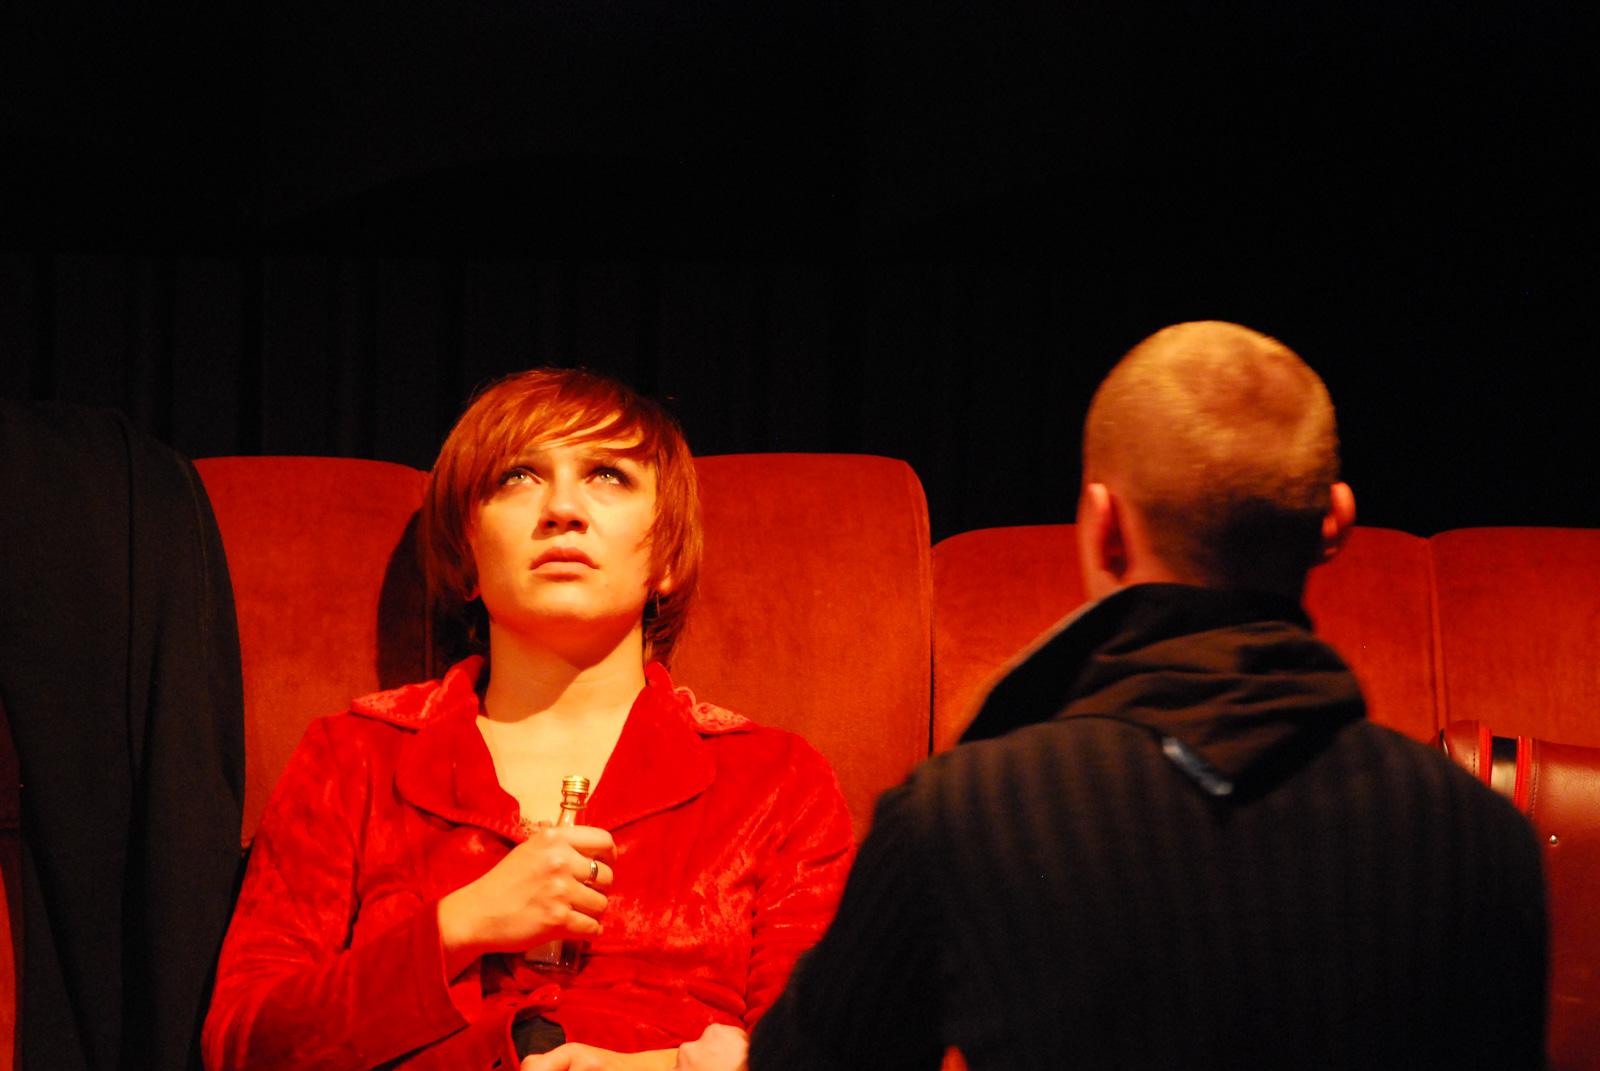 Teatro_Magico_Fantastico_13.jpg